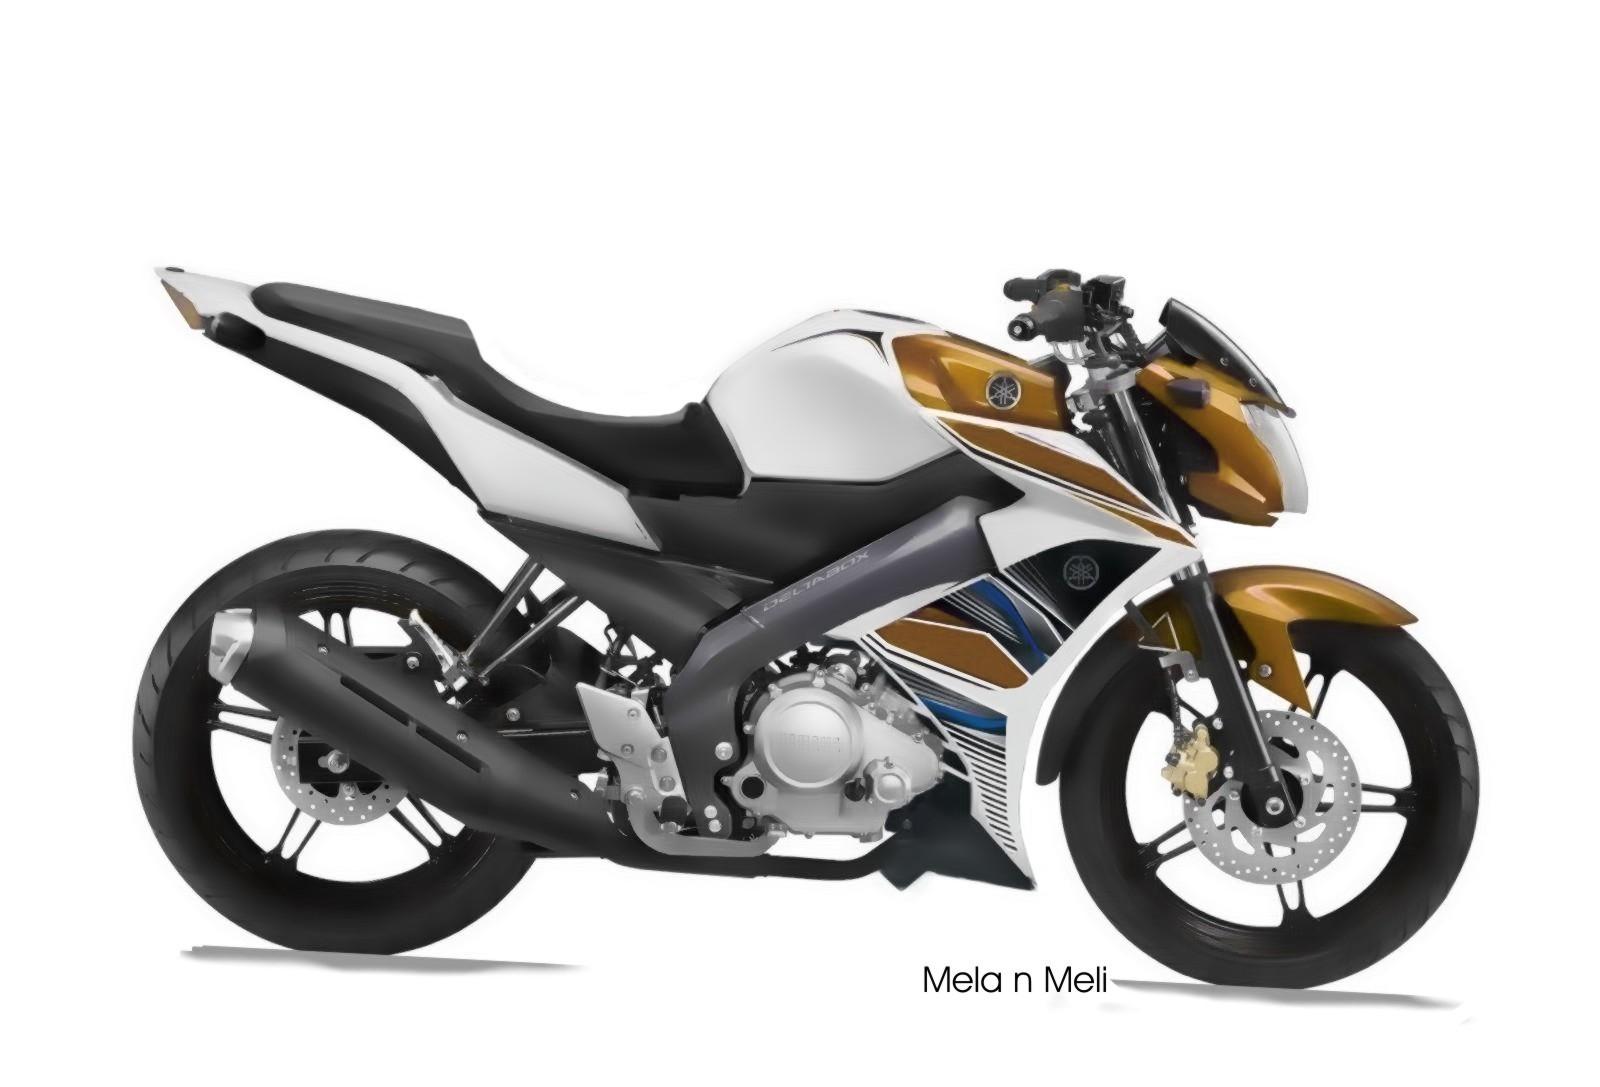 Foto Modifikasi Motor Yamaha New Vixion